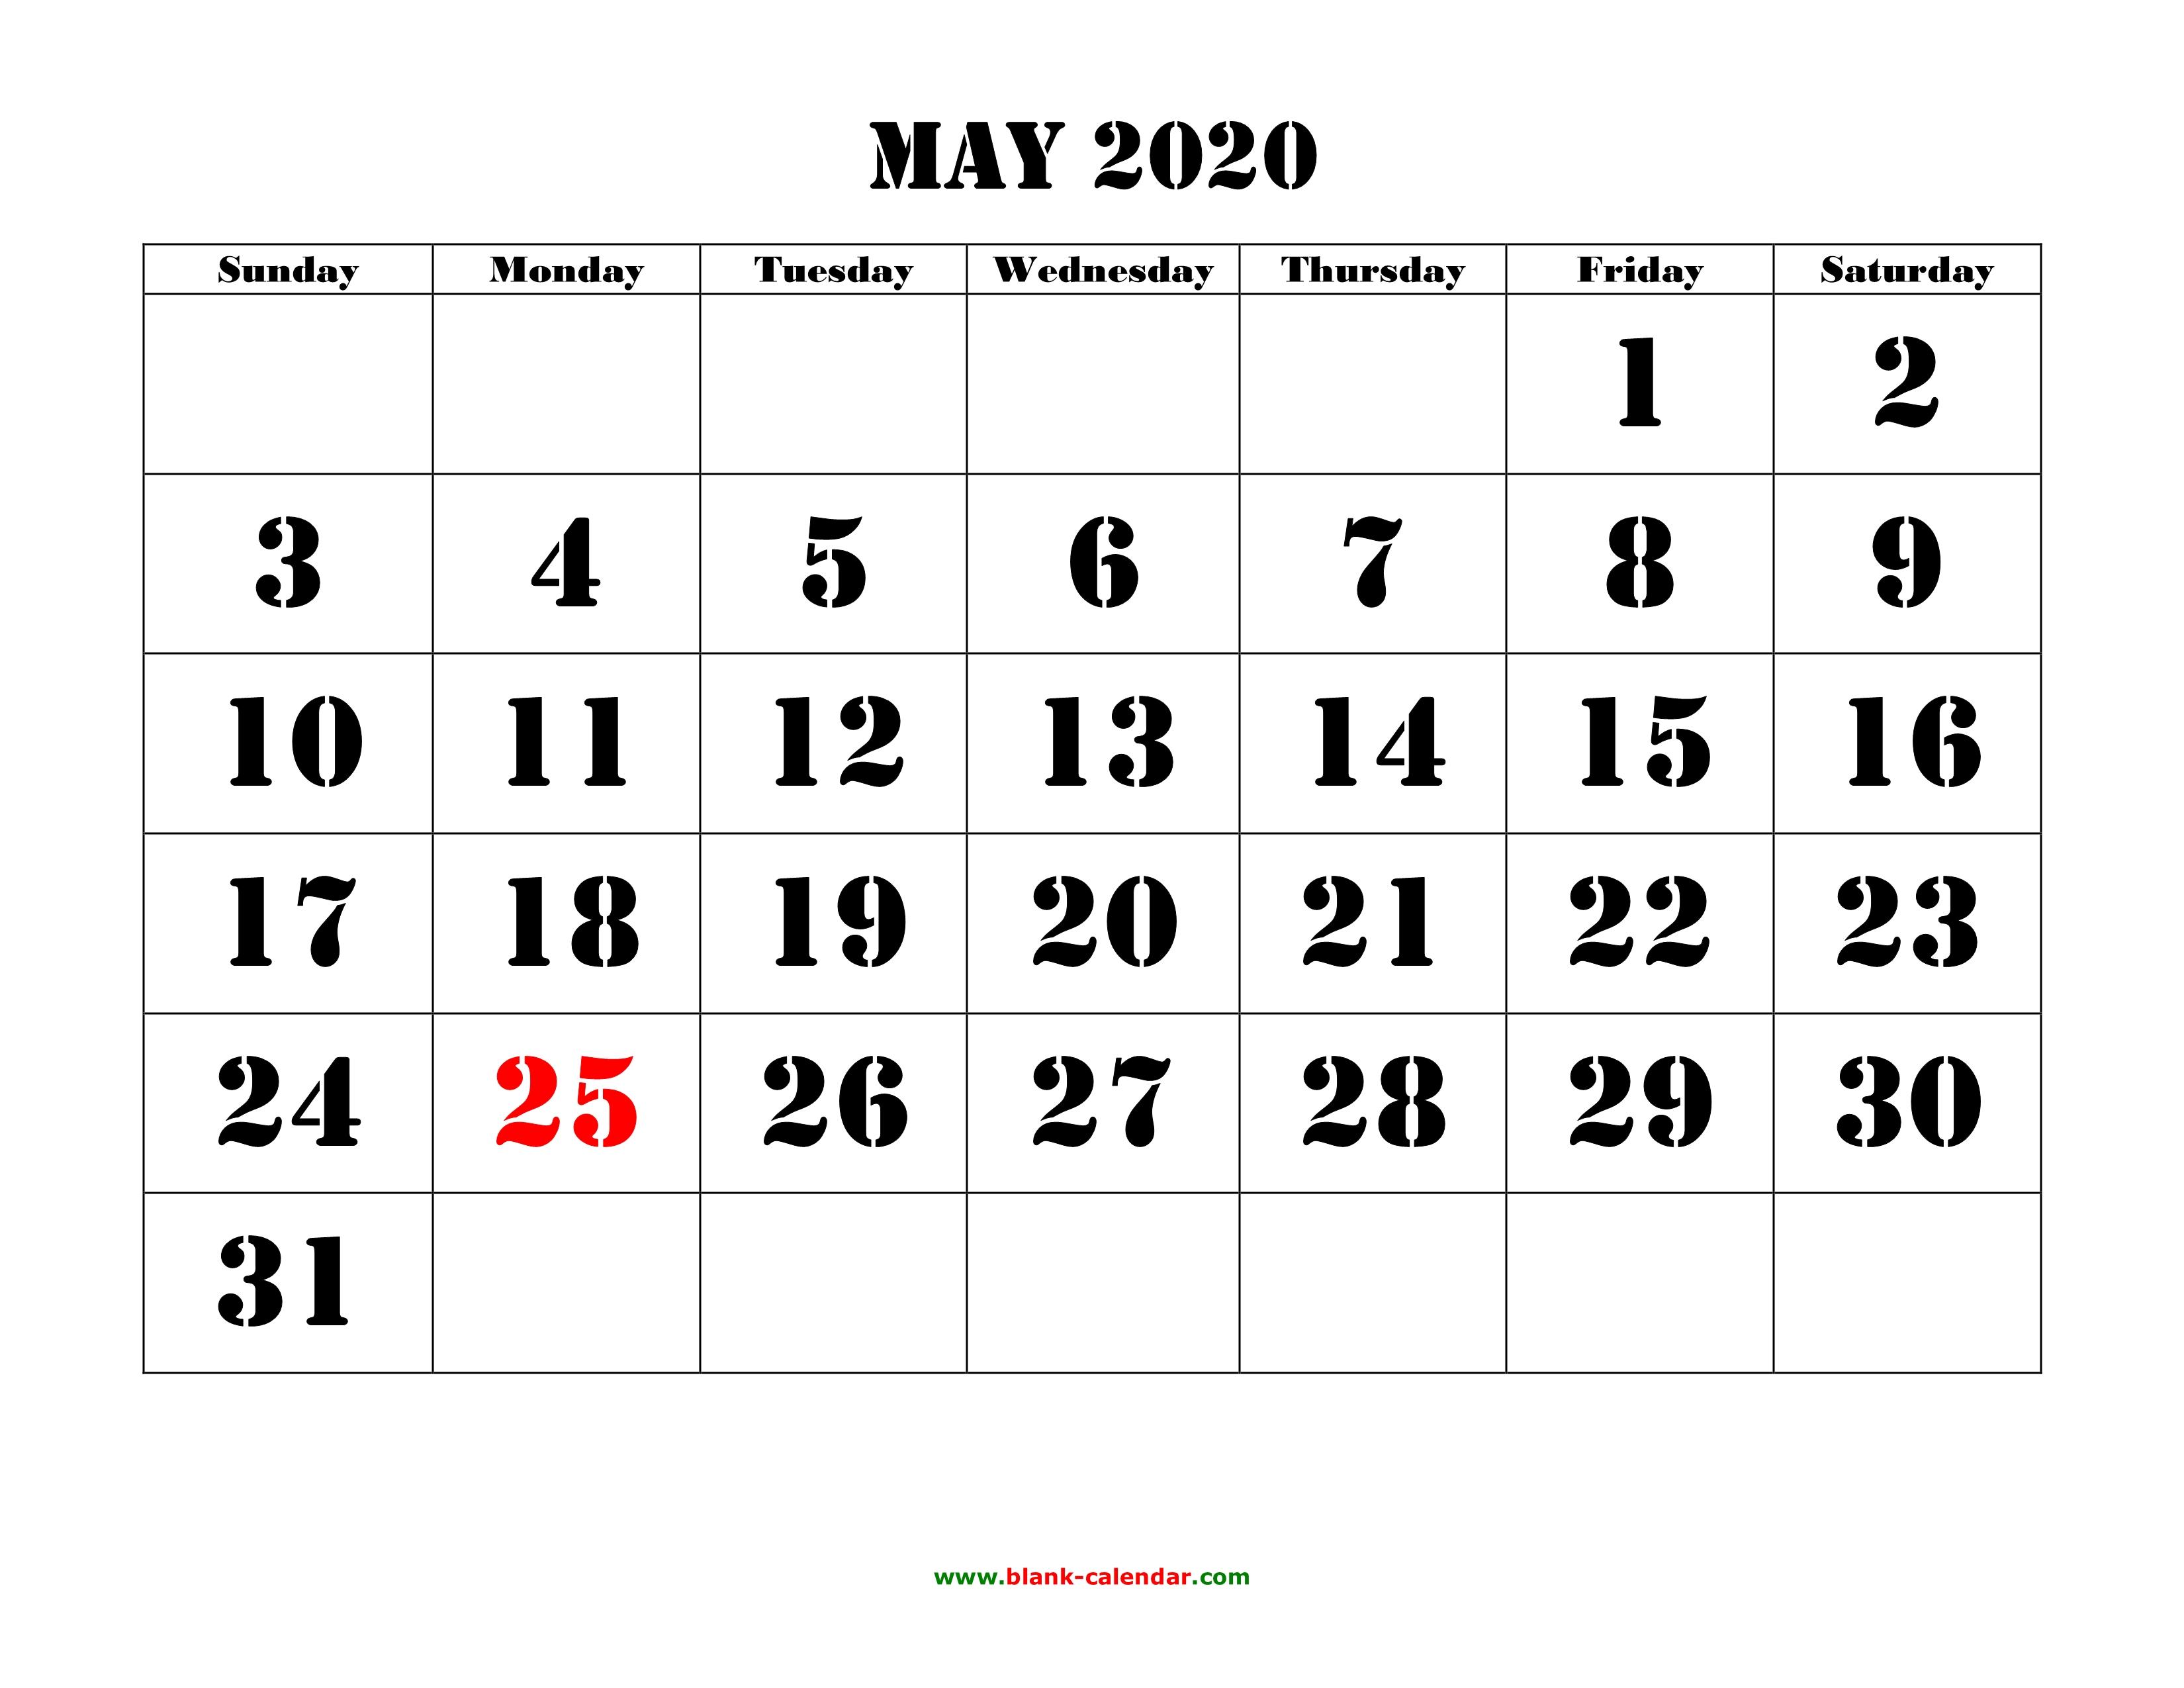 Free Download Printable May 2020 Calendar, Large Font Design for 2020 Free Printable Calendar Large Numbers